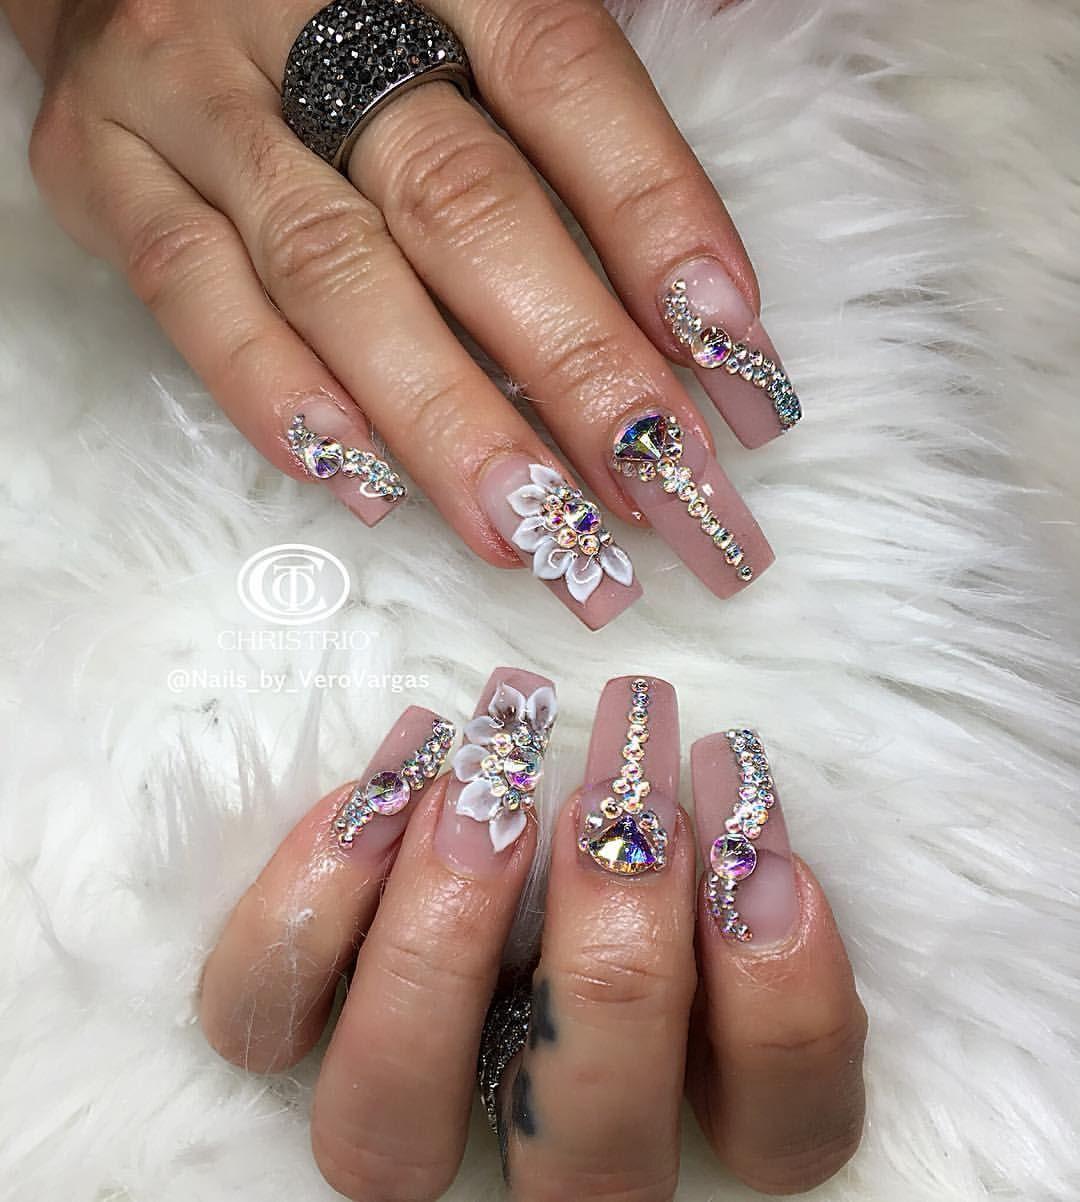 Pin by Brenda&Doey on nails | Pinterest